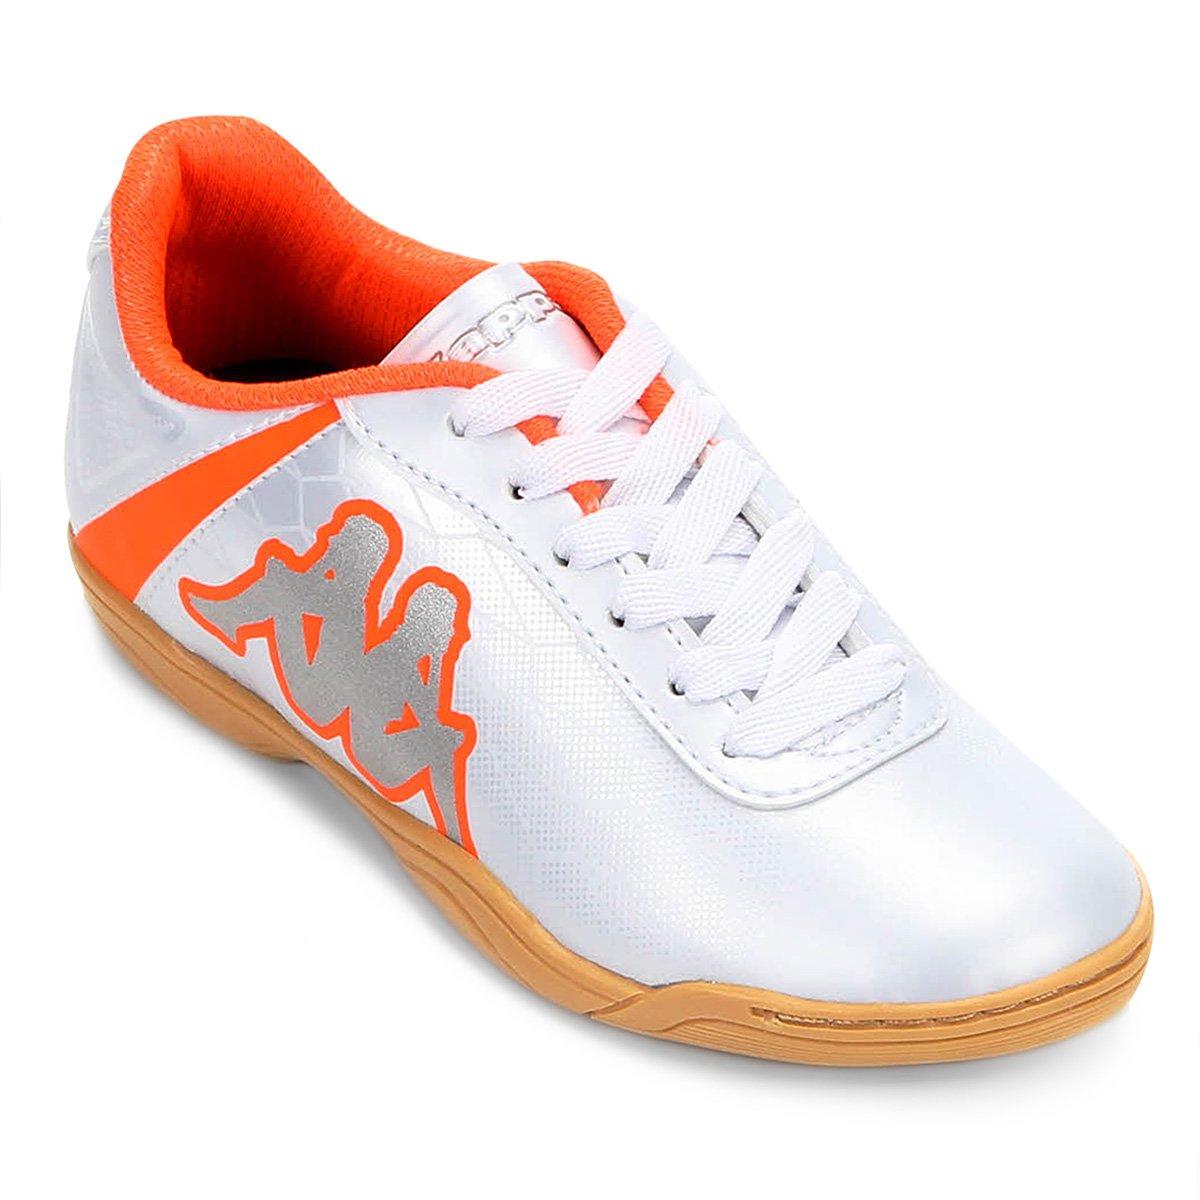 Chuteira Infantil Futsal Kappa Torpedo - Branco e Laranja - Compre ... bb79ff47a9e44